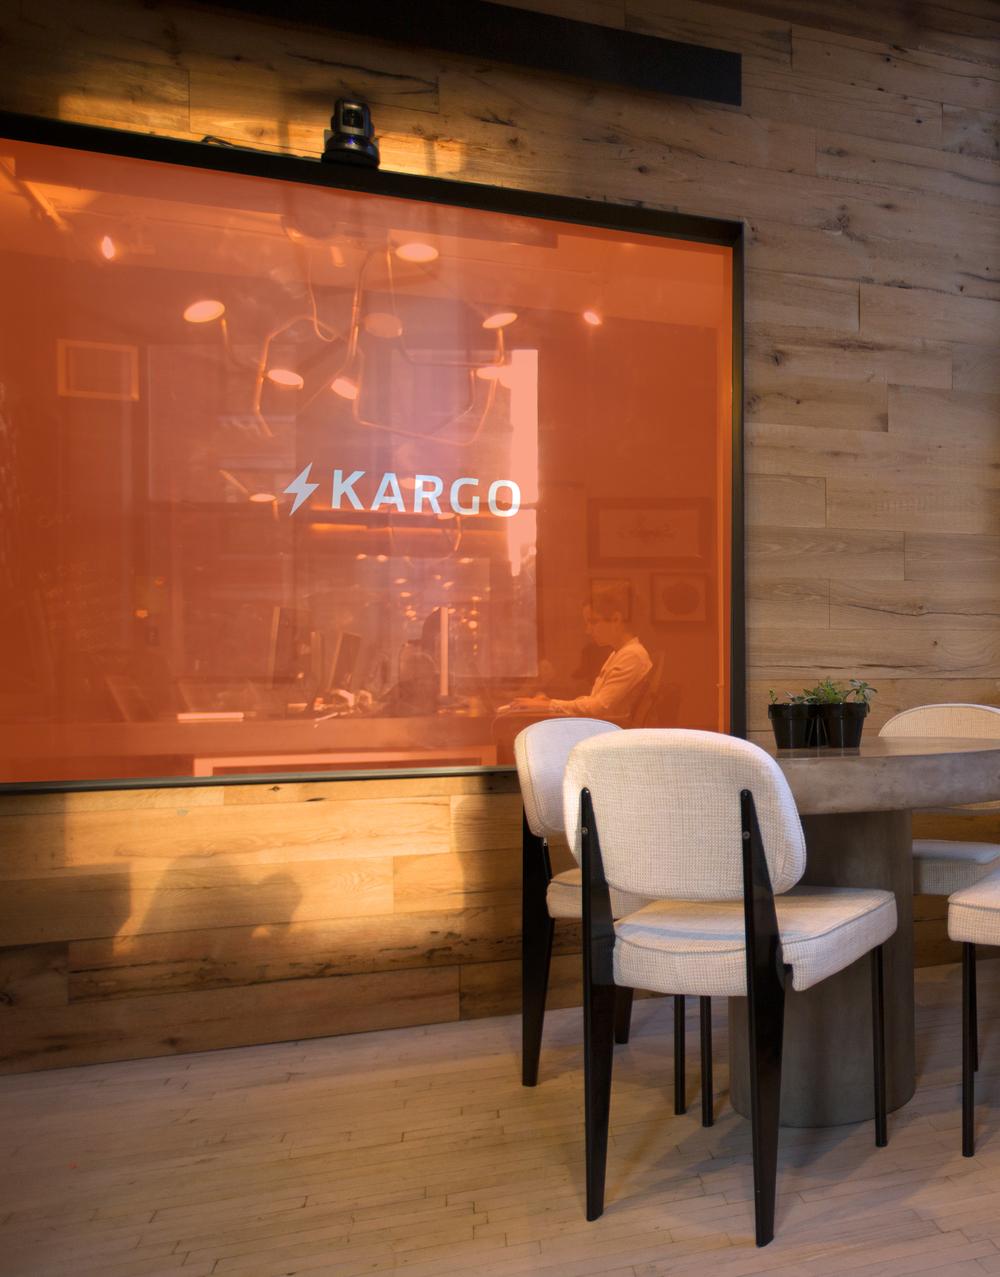 Kargo_090.jpg